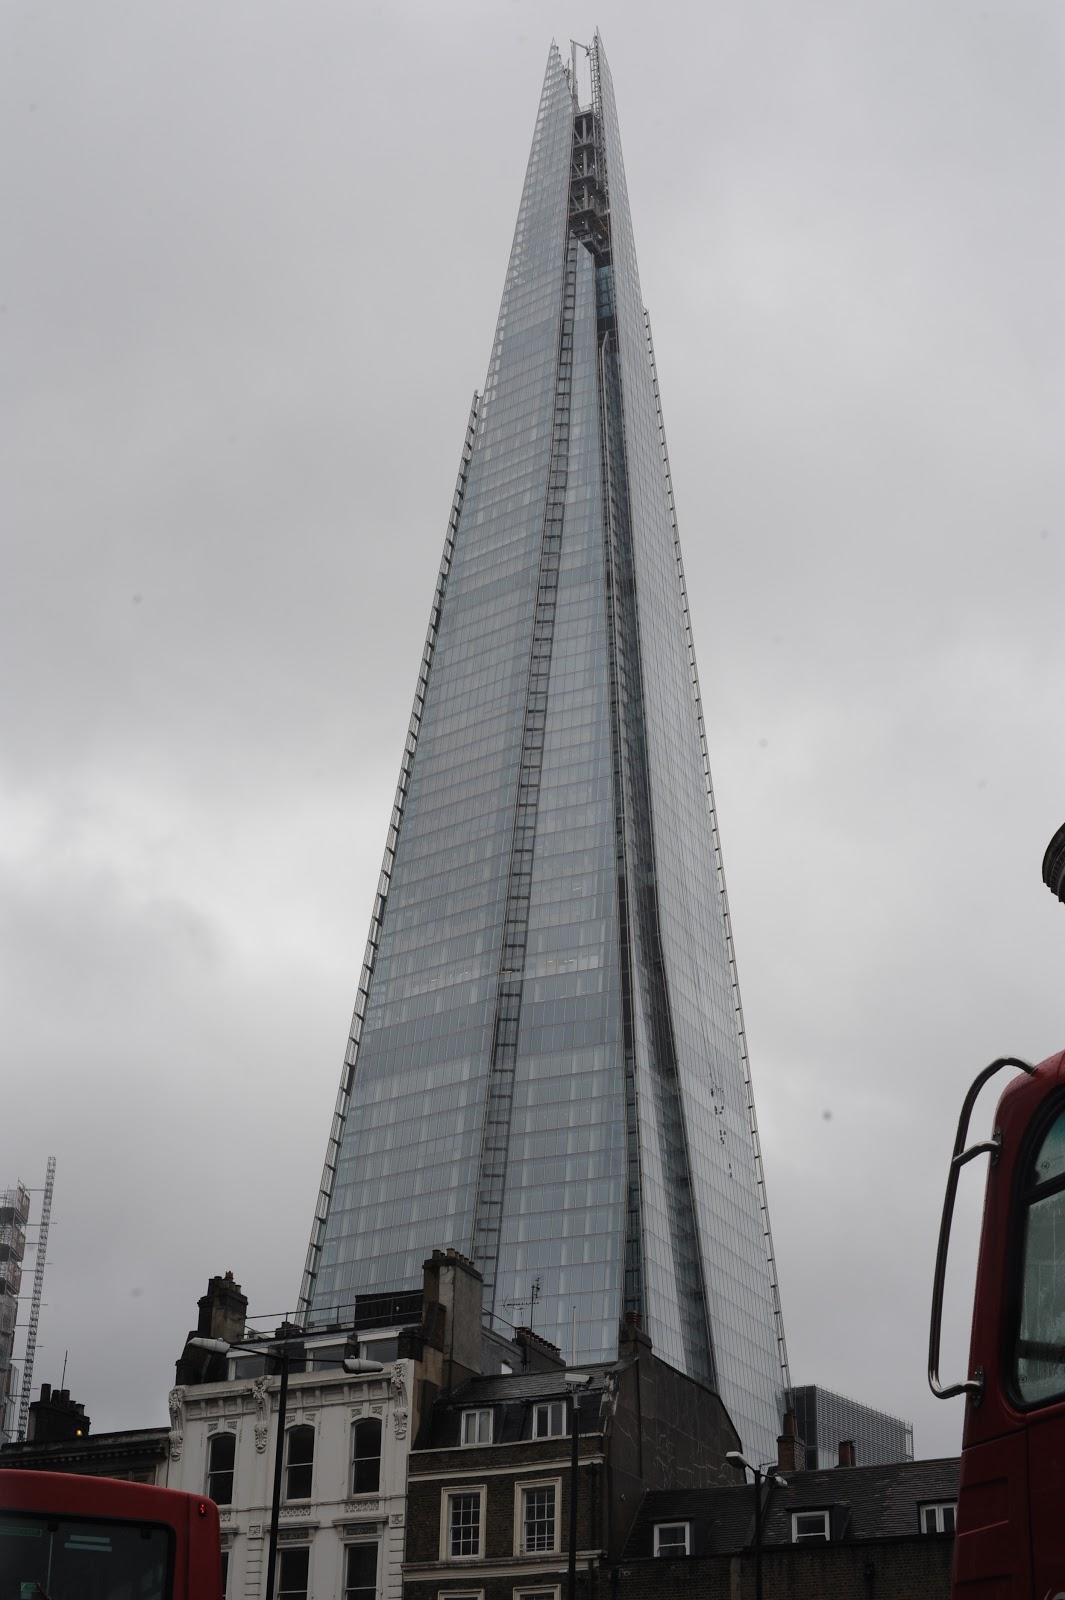 Kolla har ar londons svar pa eiffeltornet